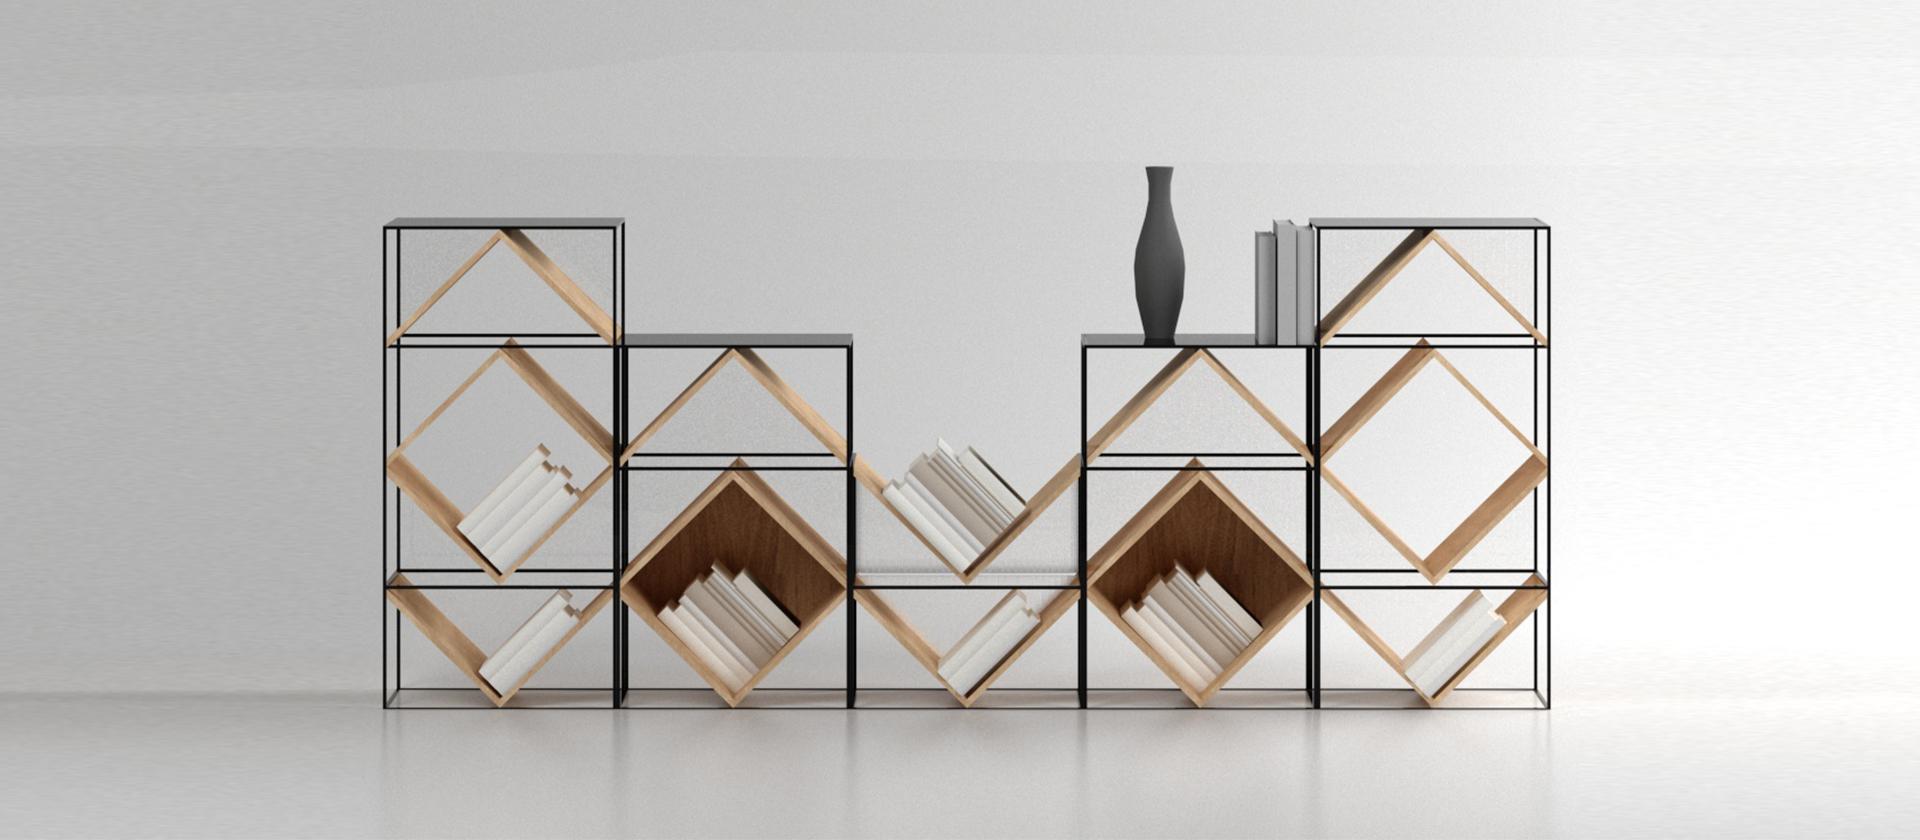 fidi the florence institute of design international italy design